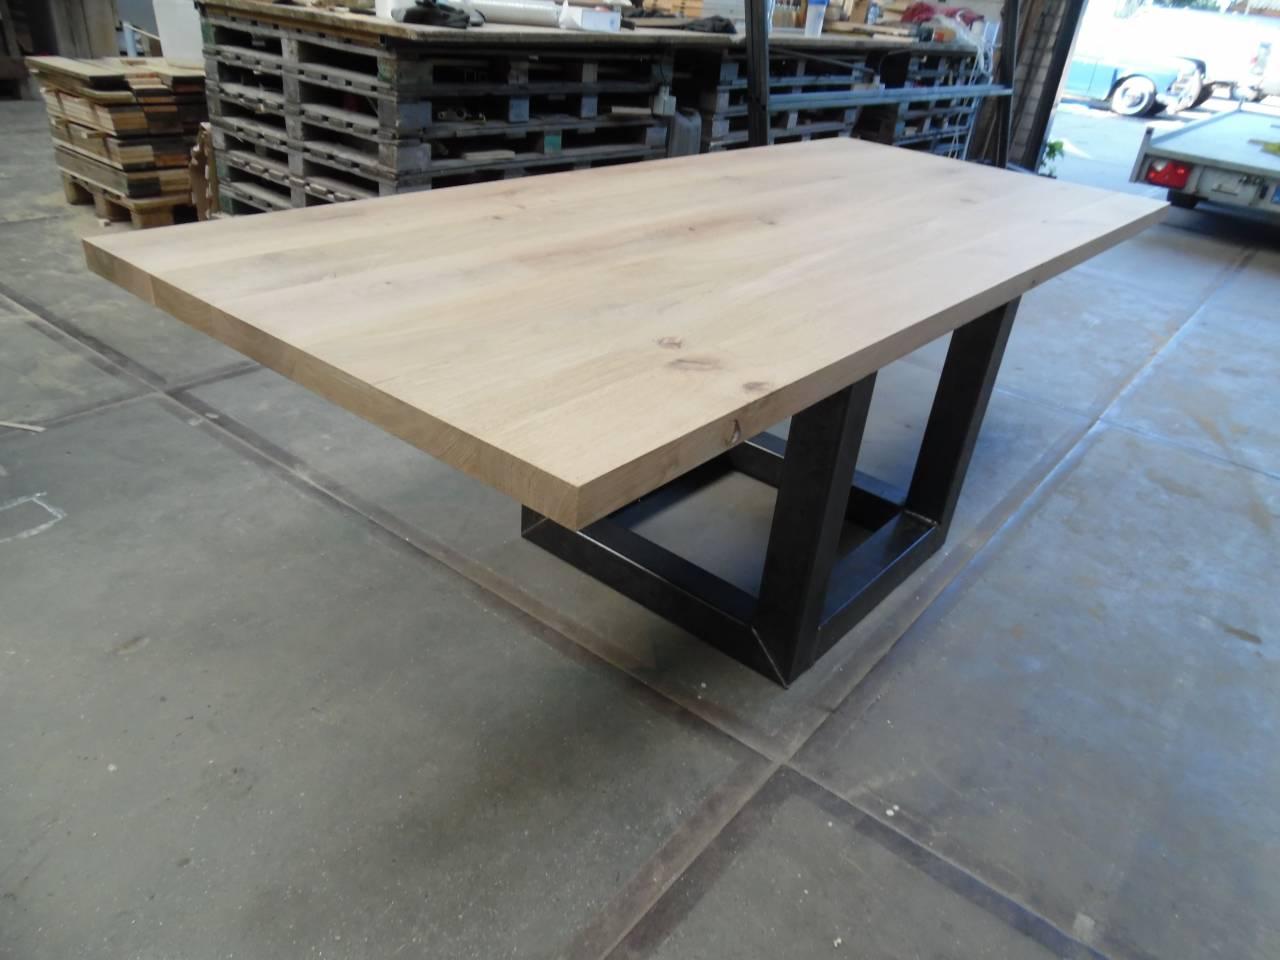 899 99 in winkelmand sku 0089 categorie n meubels woning tafels gebruikt hout horeca kantoor - Winkel kubus ...